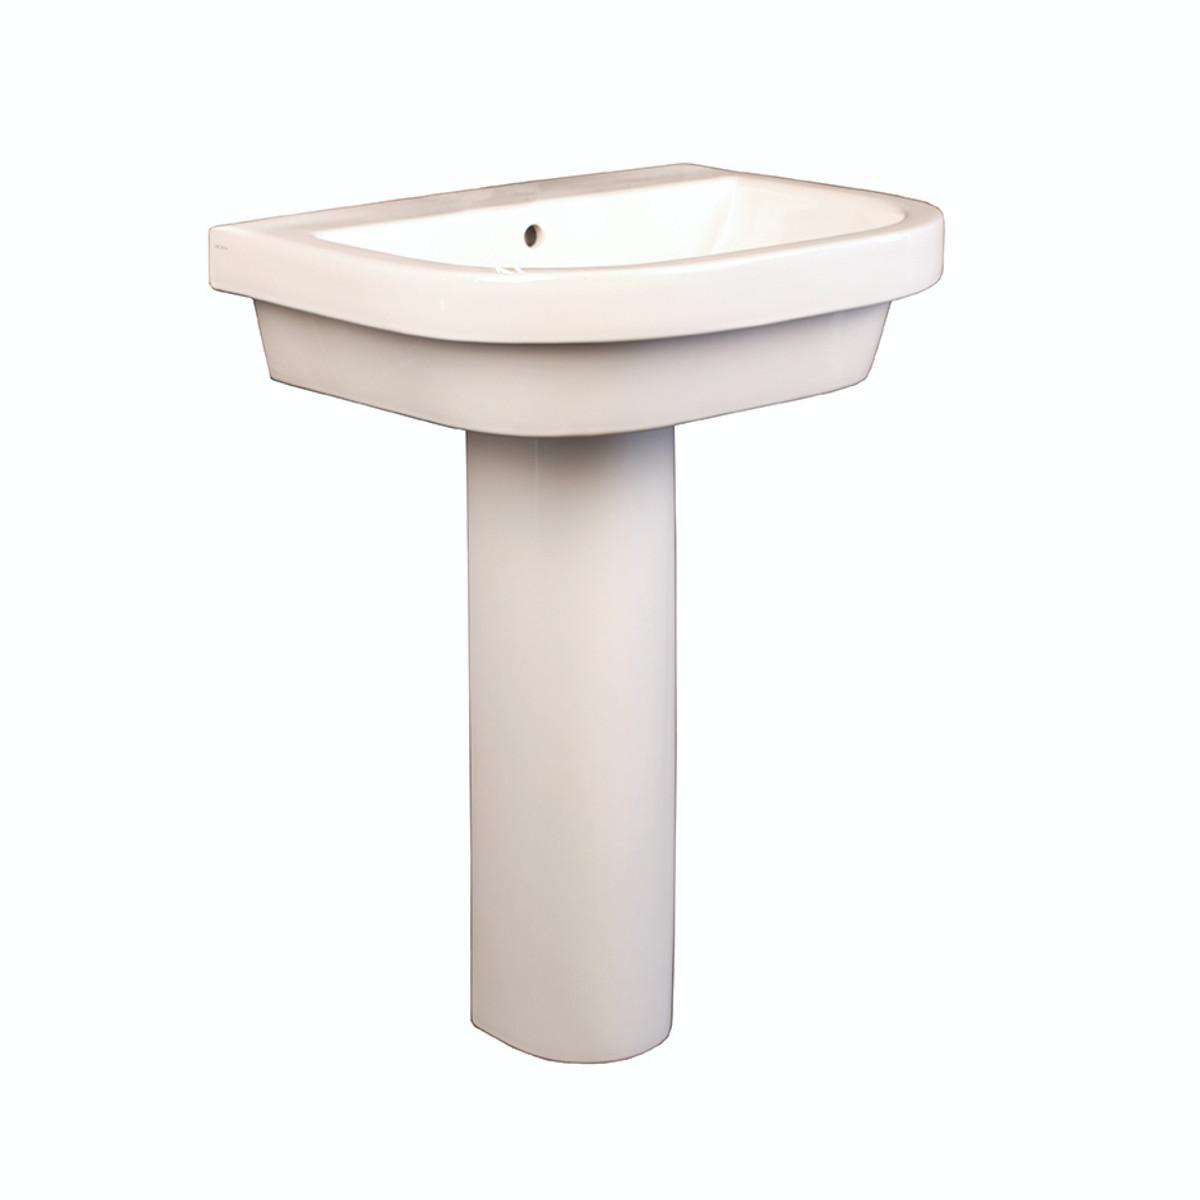 "4231 Alia Full Pedestal 7""W"